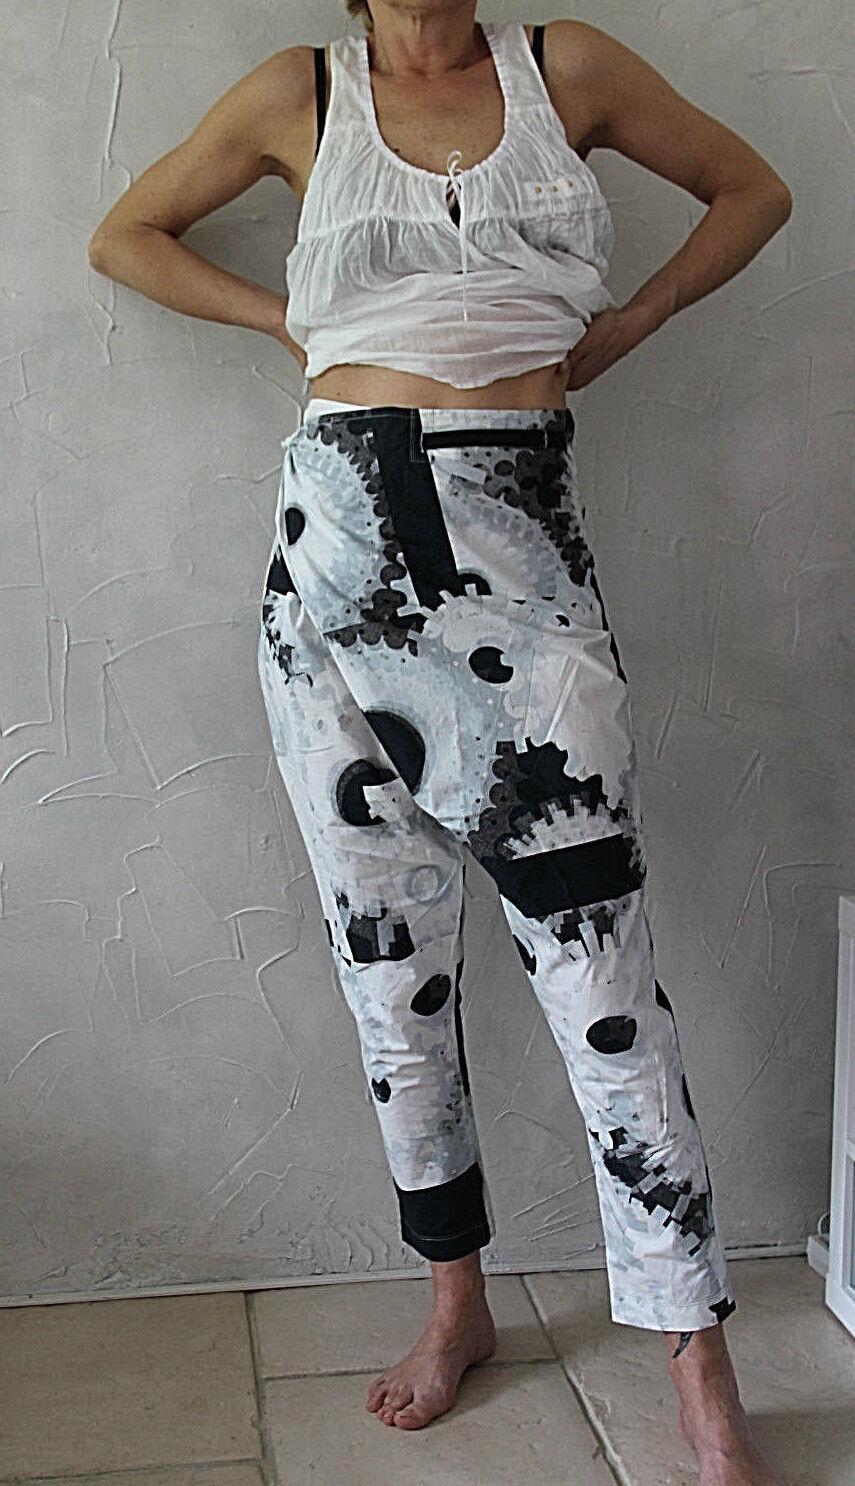 Pantalon tablier MARITHÉ FRANCOIS GIRBAUD size 42 fr 46i 40D NEUF ÉTIQUETTE